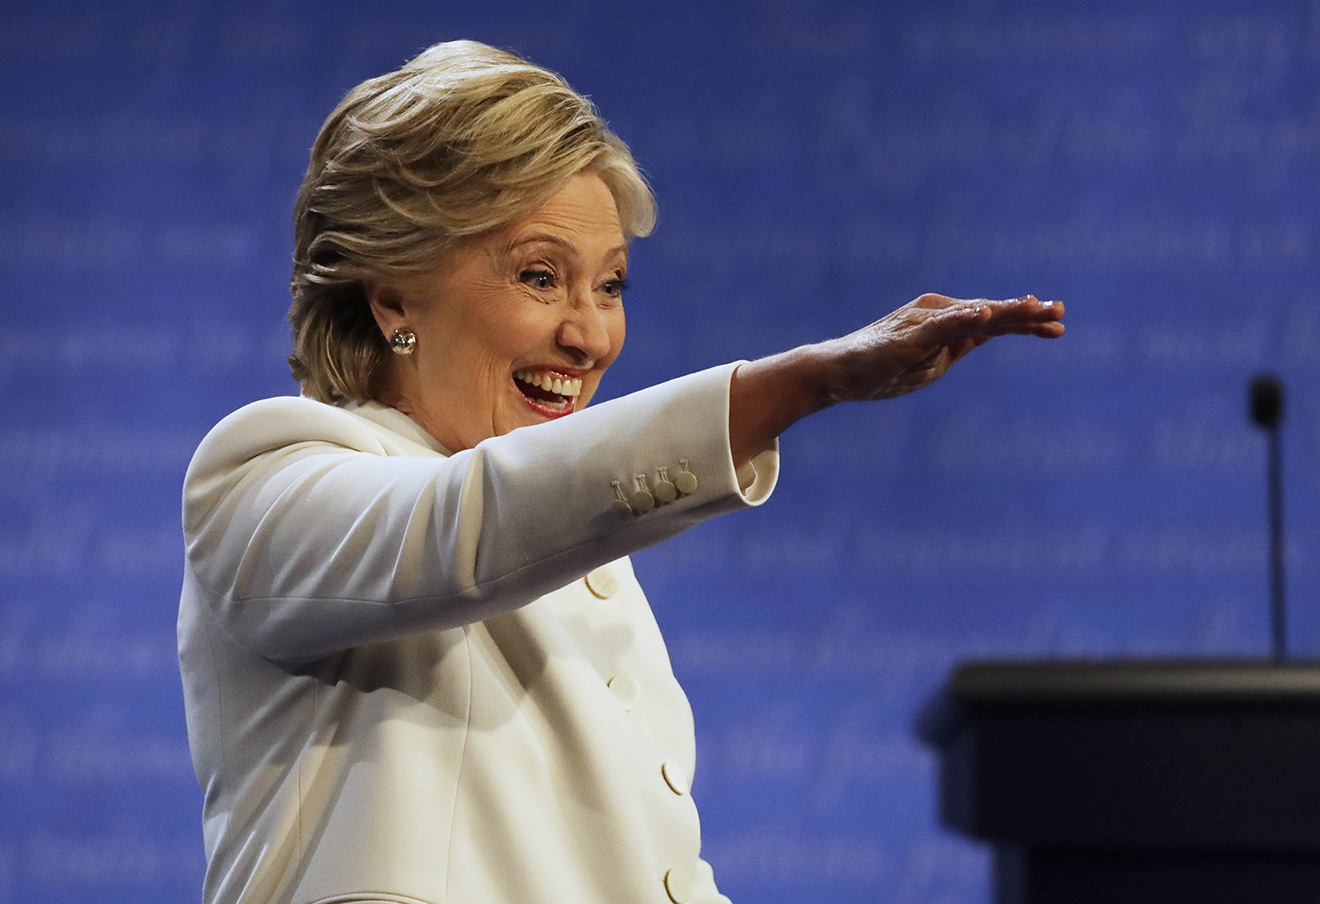 Хиллари Клинтон, 19 октября 2016 года. Фото: Patrick Semansky / AP